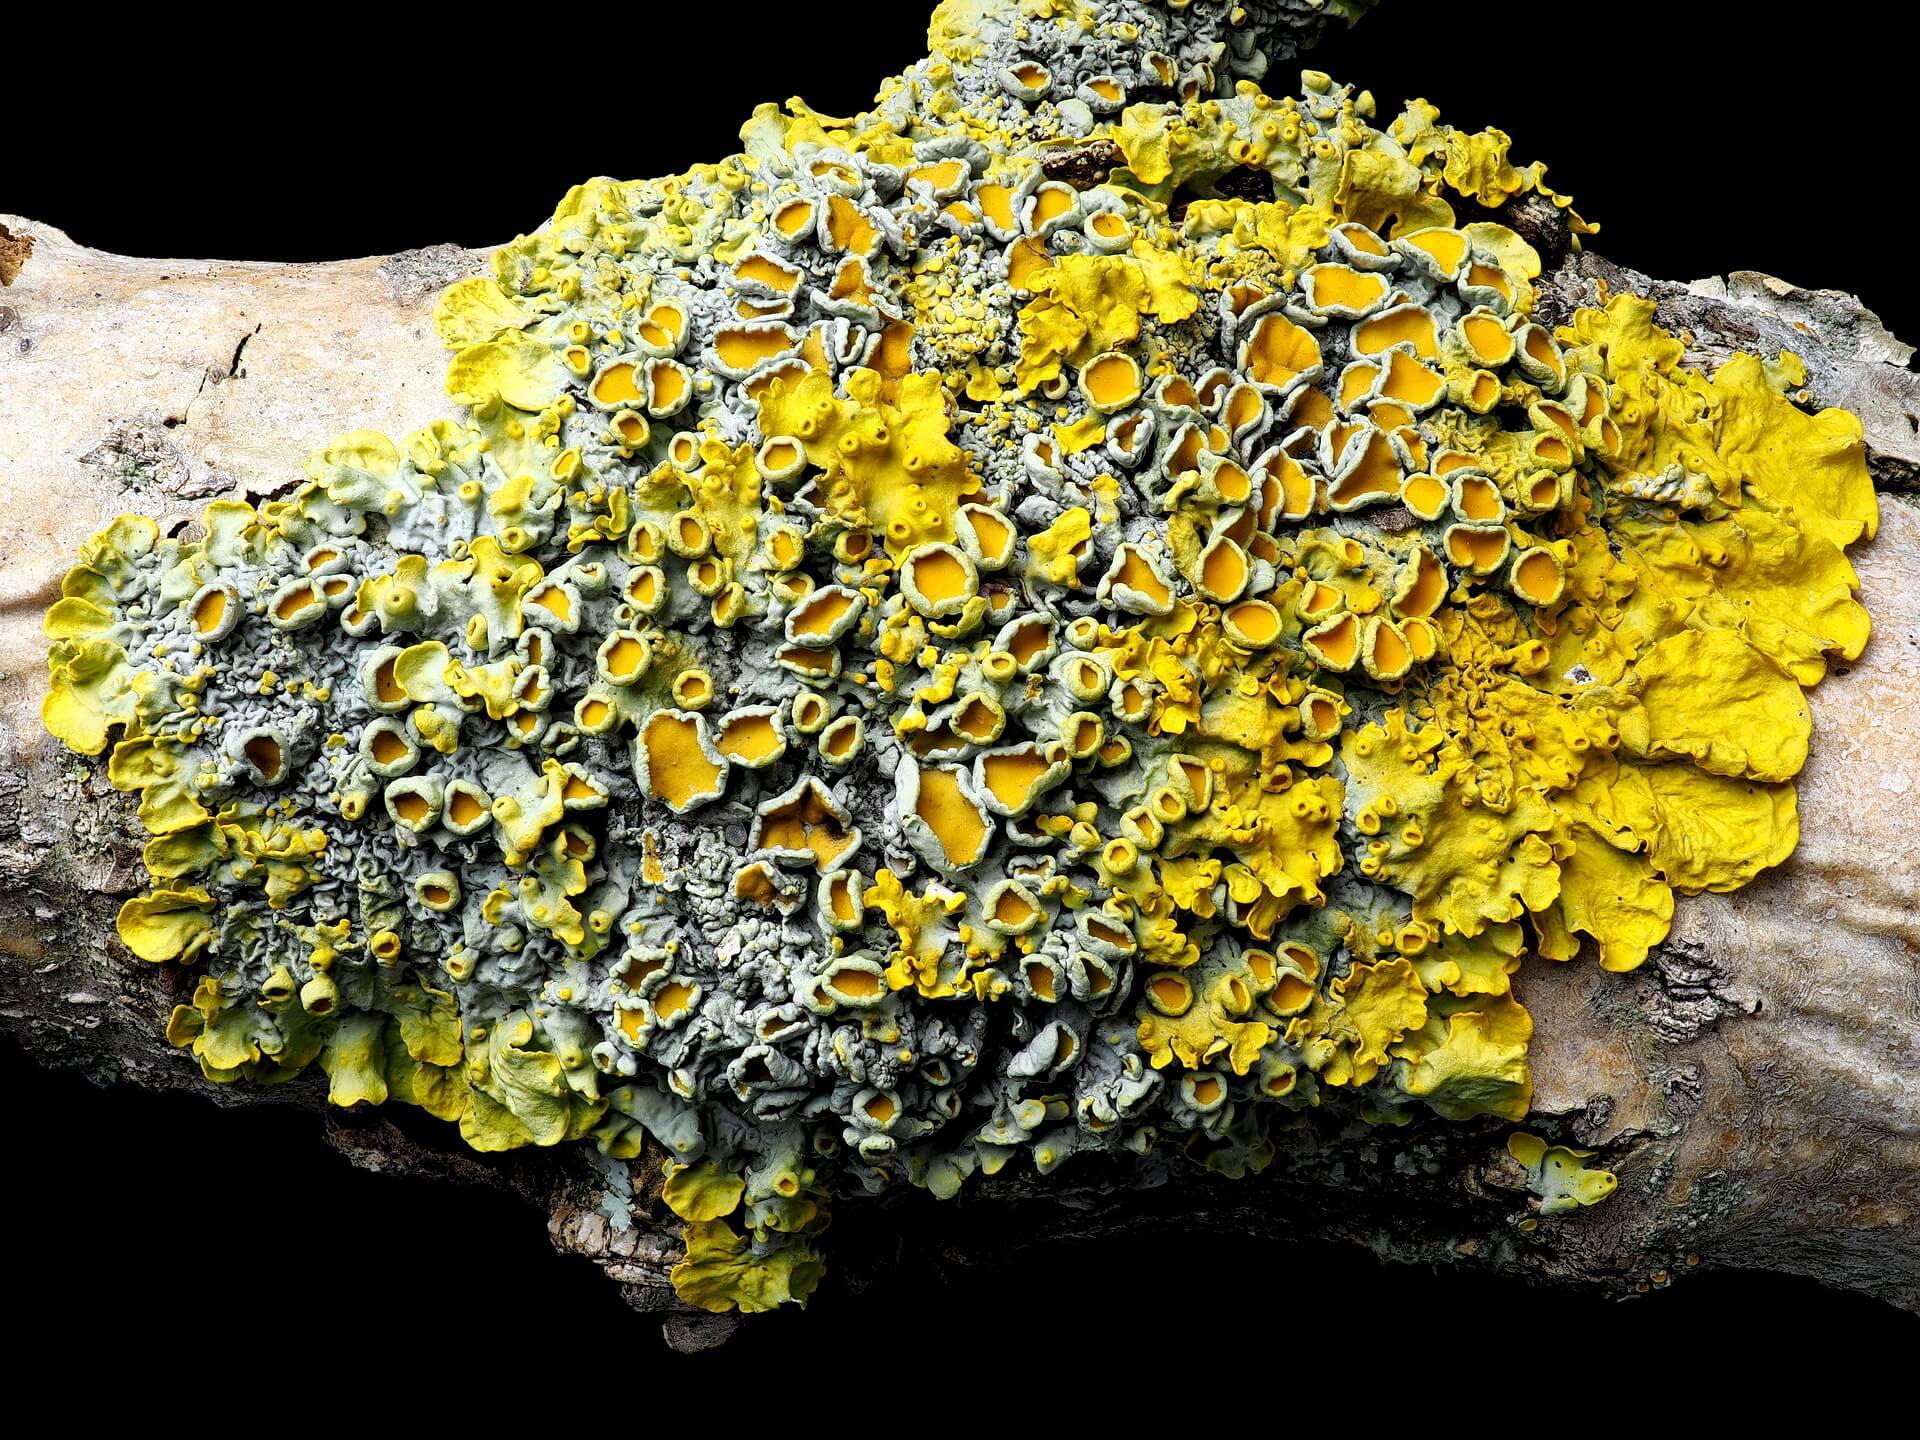 A tree branch with Sunburst Lichen growing on it.